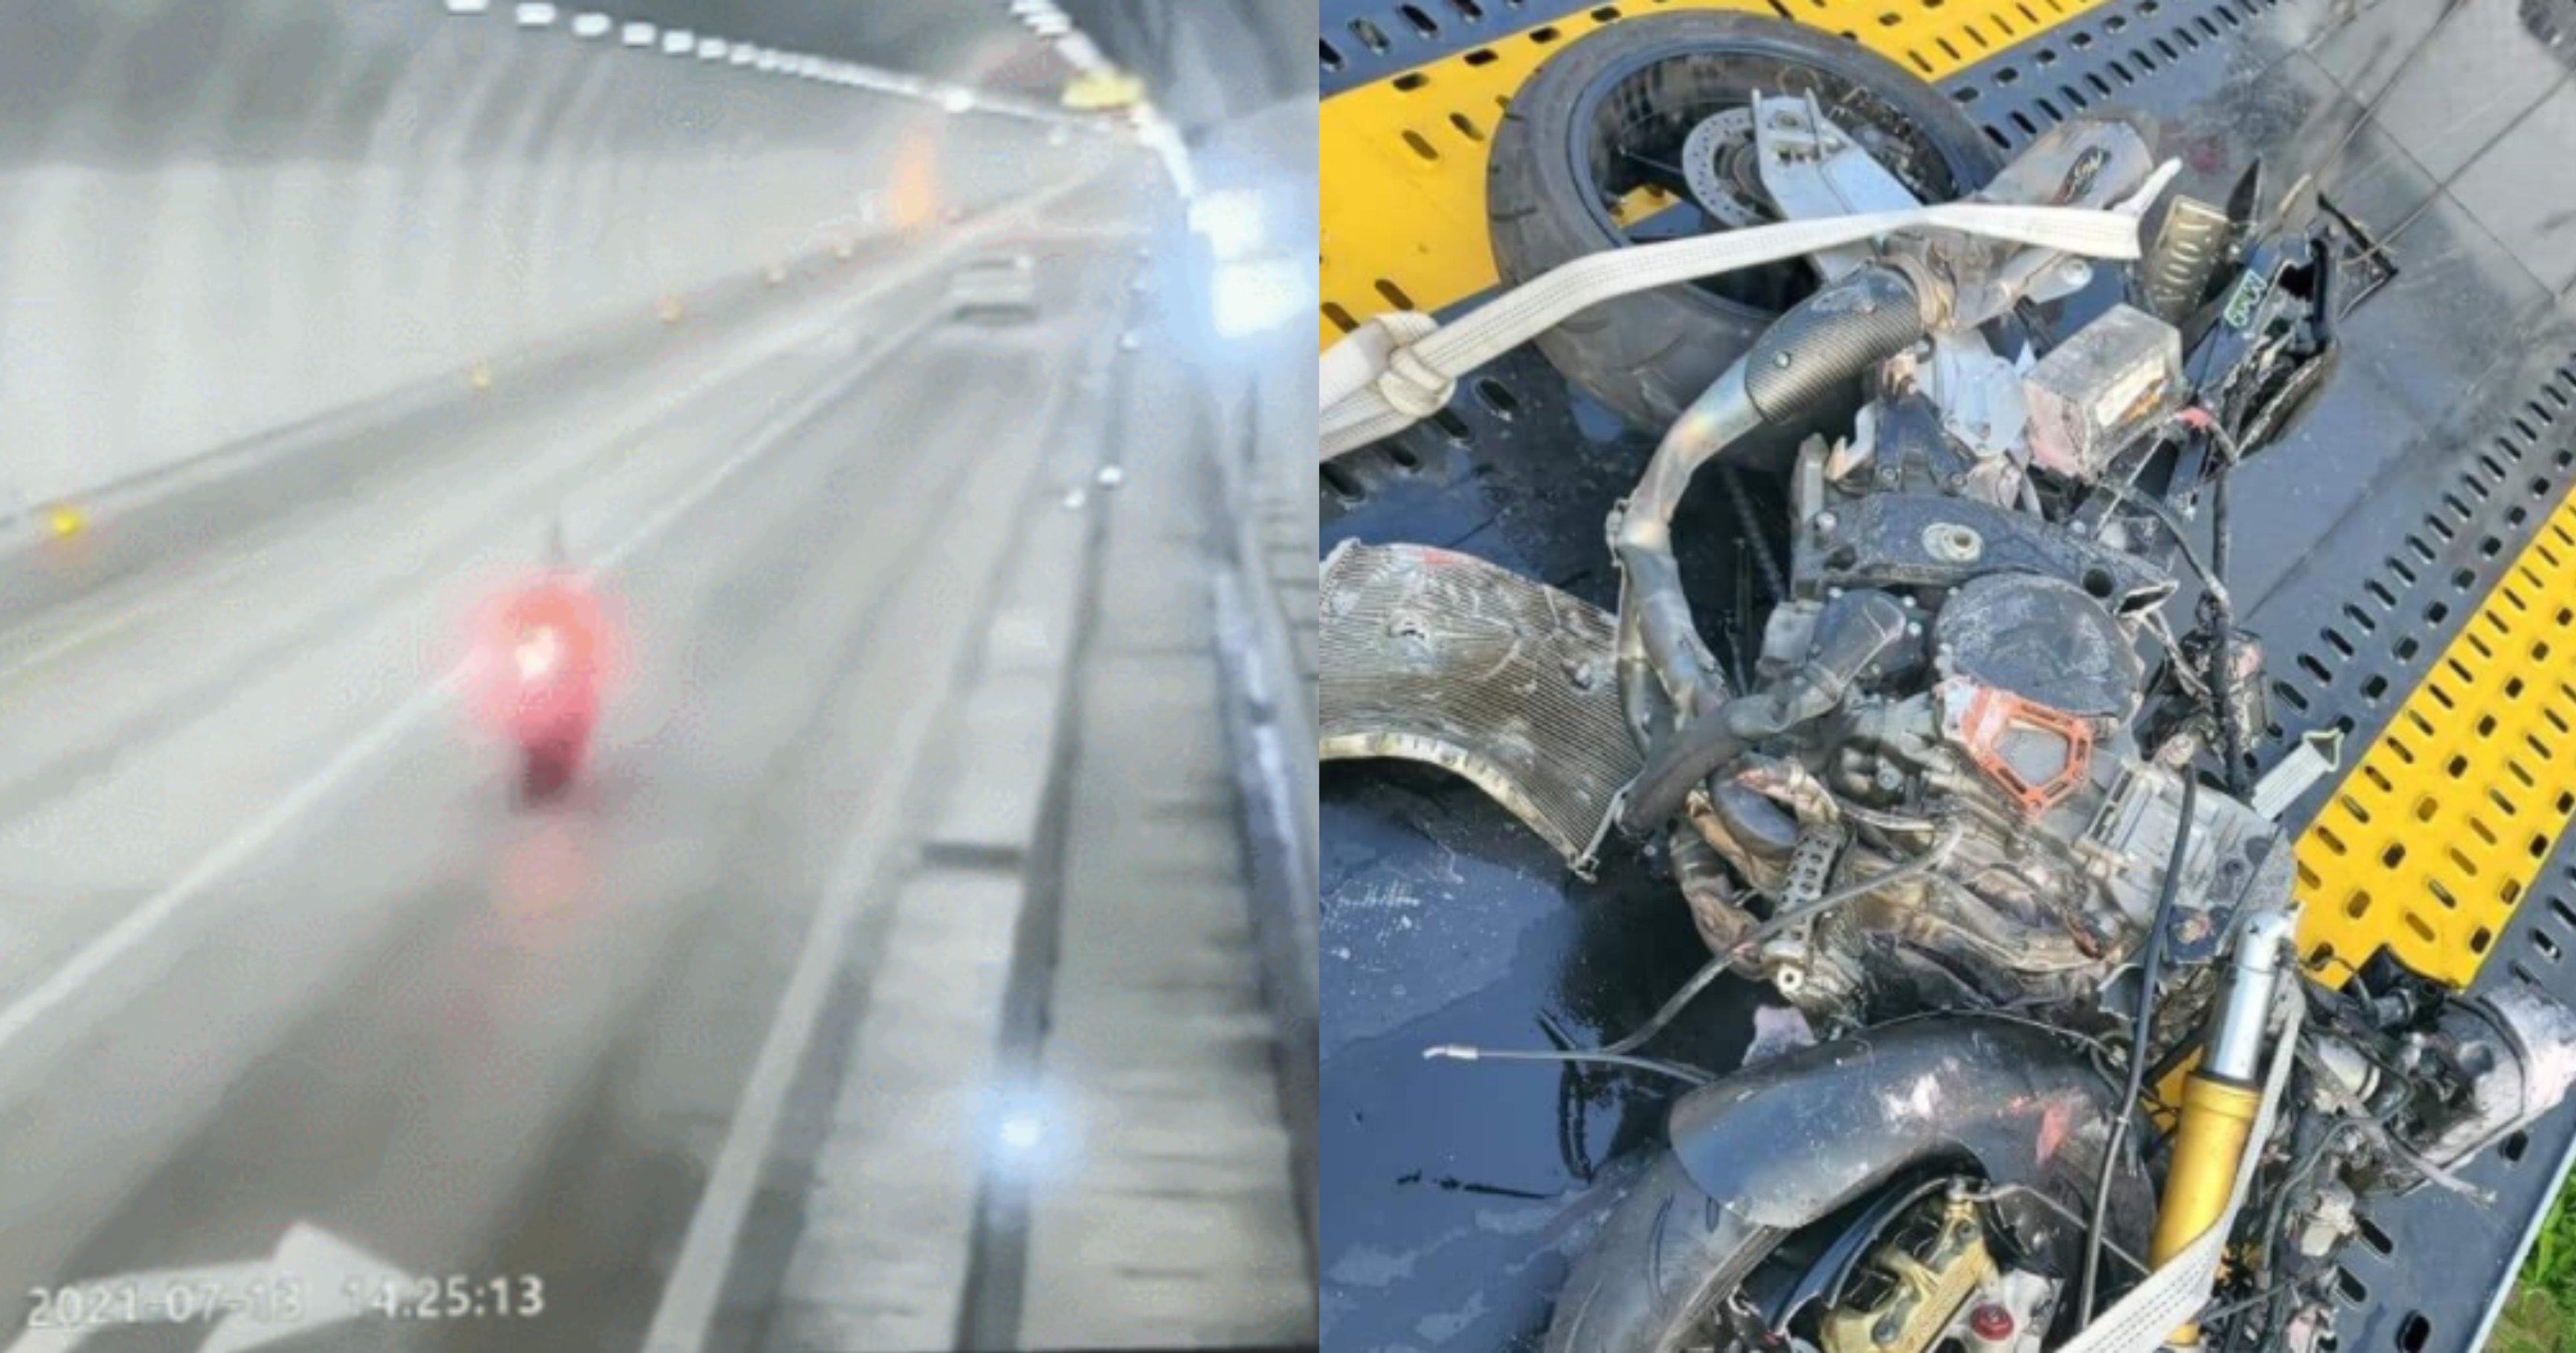 img 197dbfbed2f9 1.jpeg?resize=412,232 - 최근 미시령에서 벌어진 오토바이 사고 블랙박스 사진